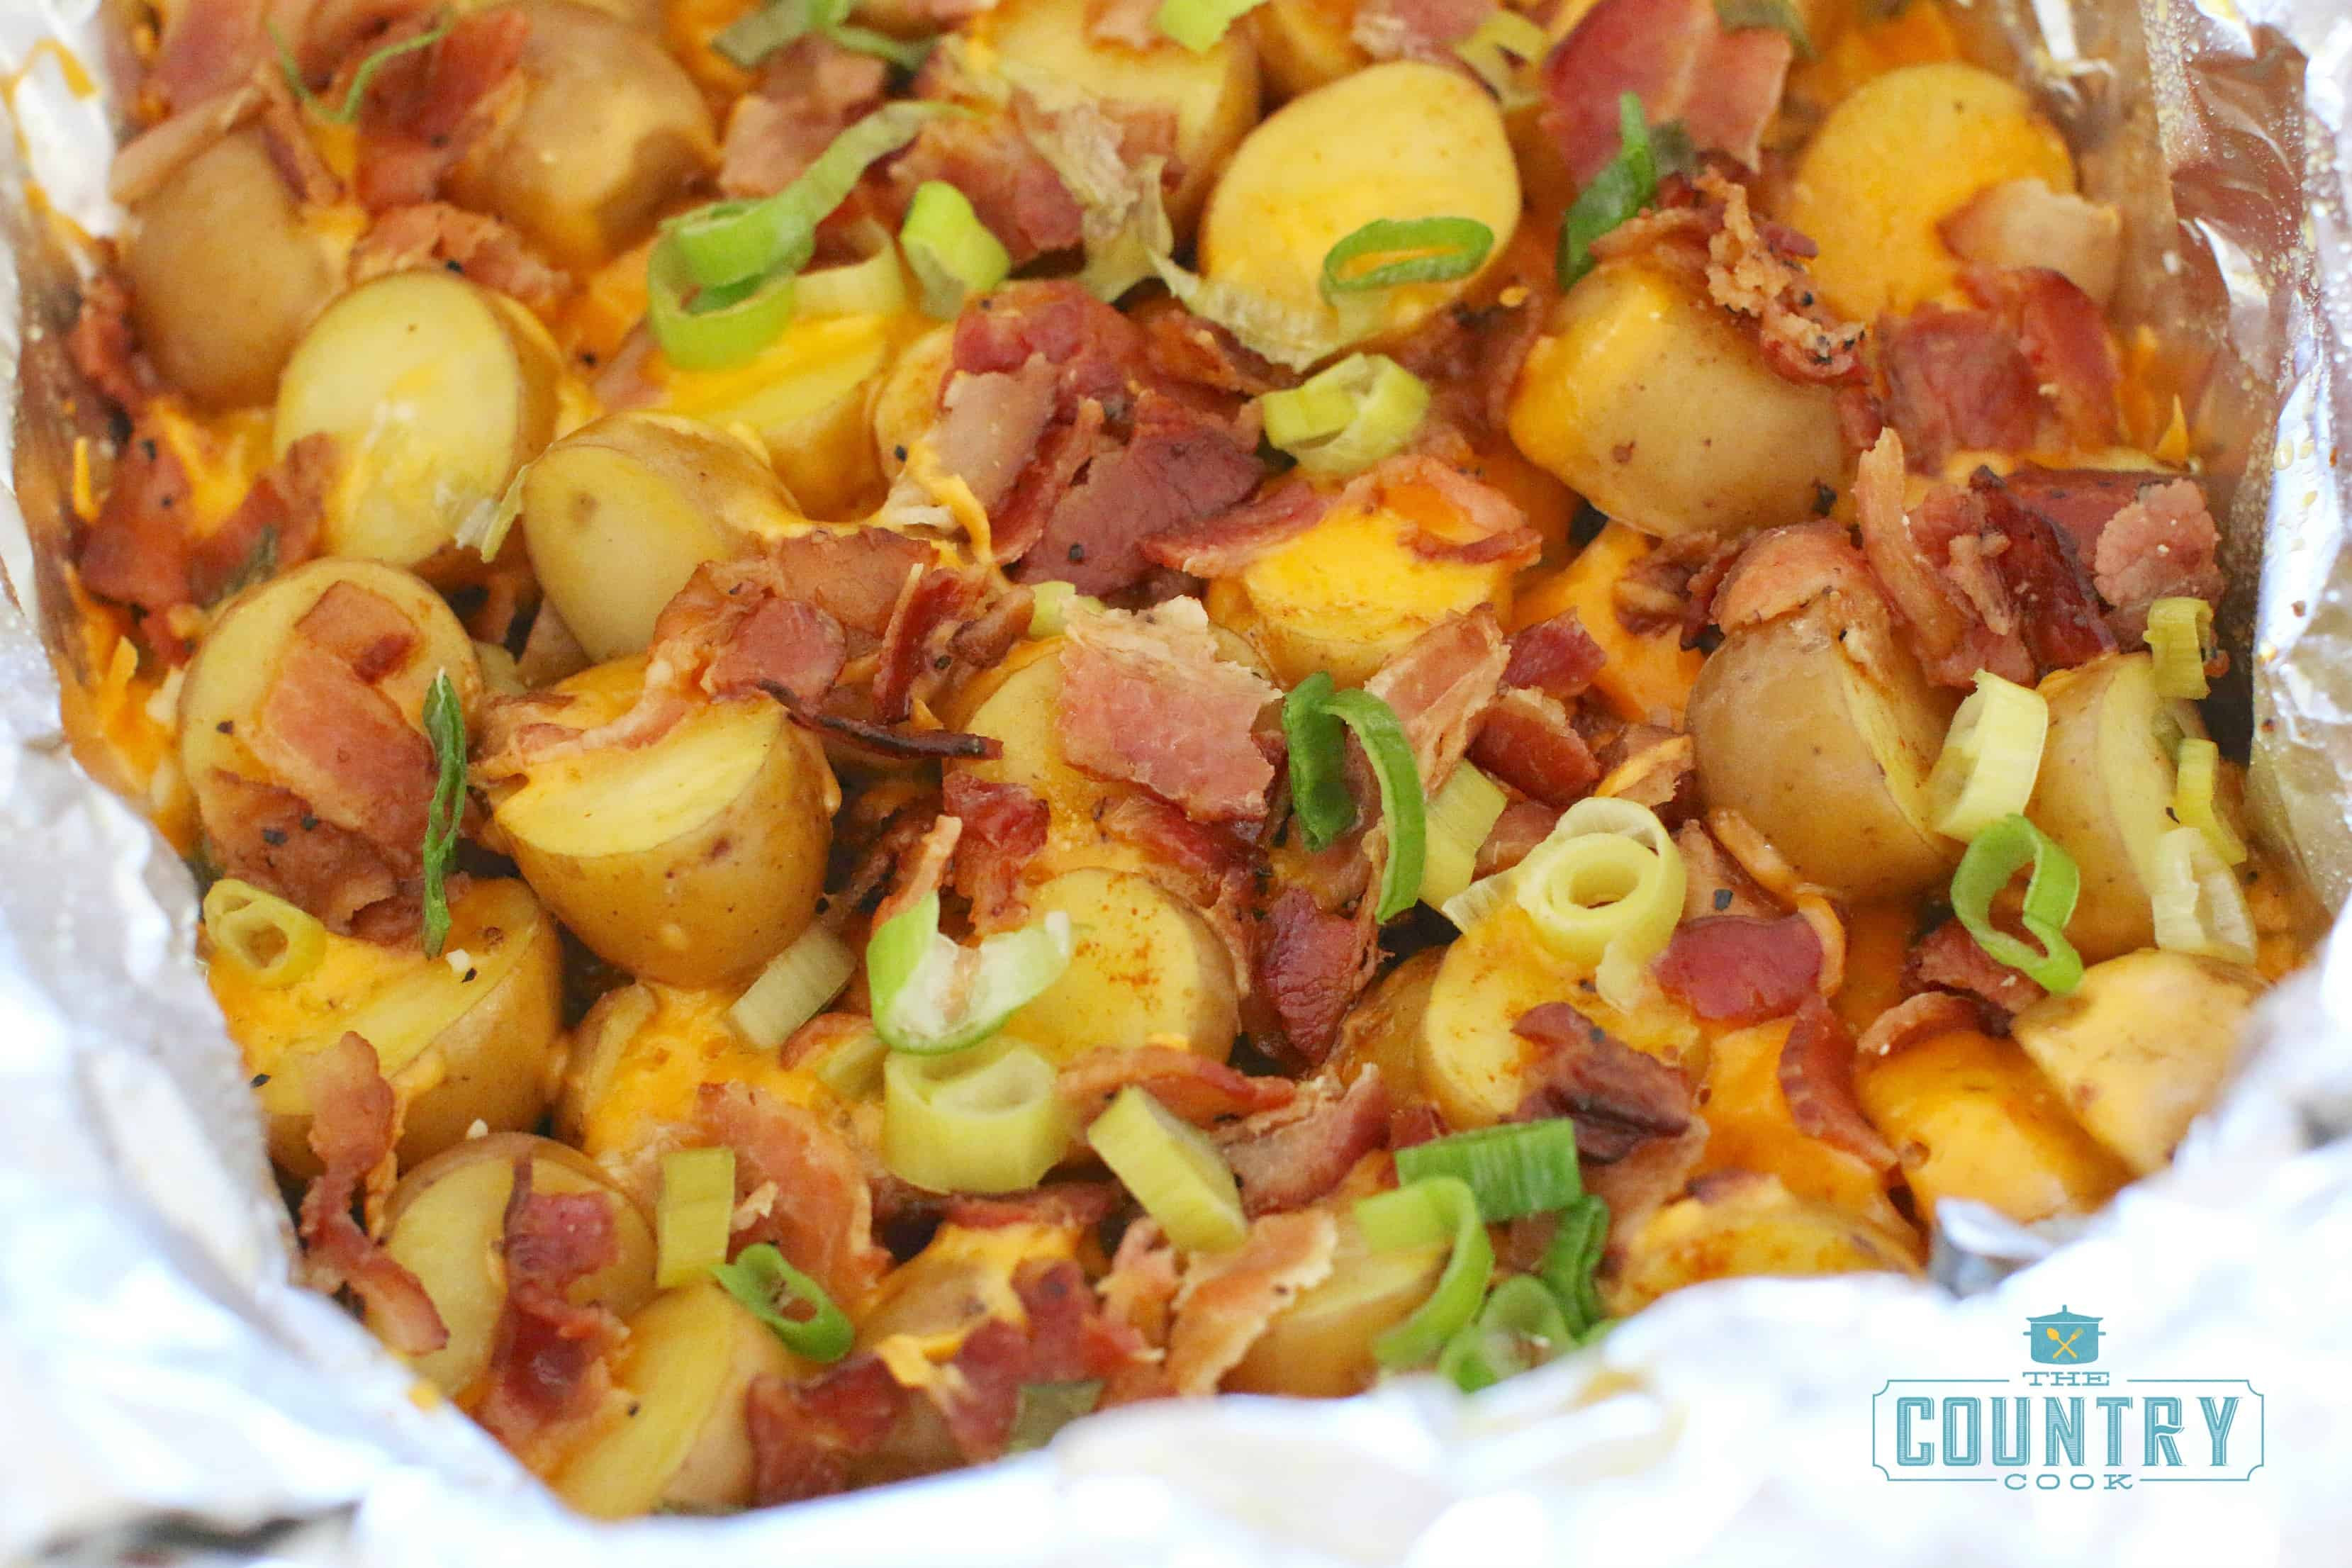 Crock Pot Potato Recipes  Crock Pot Loaded Little Potatoes The Country Cook